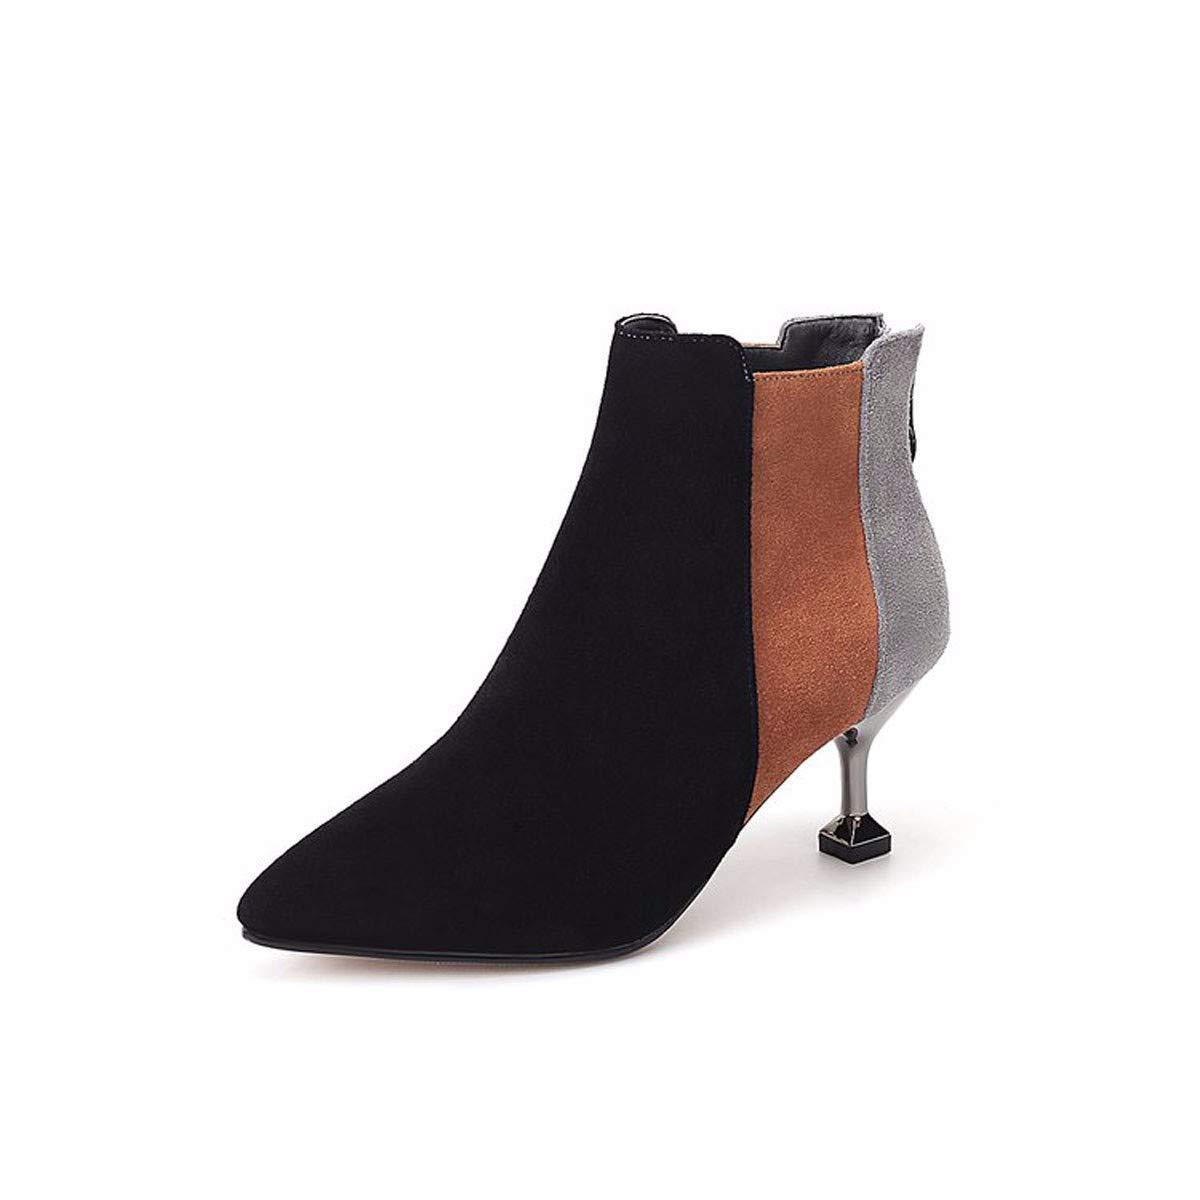 GTVERNH Frauen Schuhe/Martin Stiefel Herbst Mitte Mode Mode Scharfen Dünnen Und Mutter Schuhe.